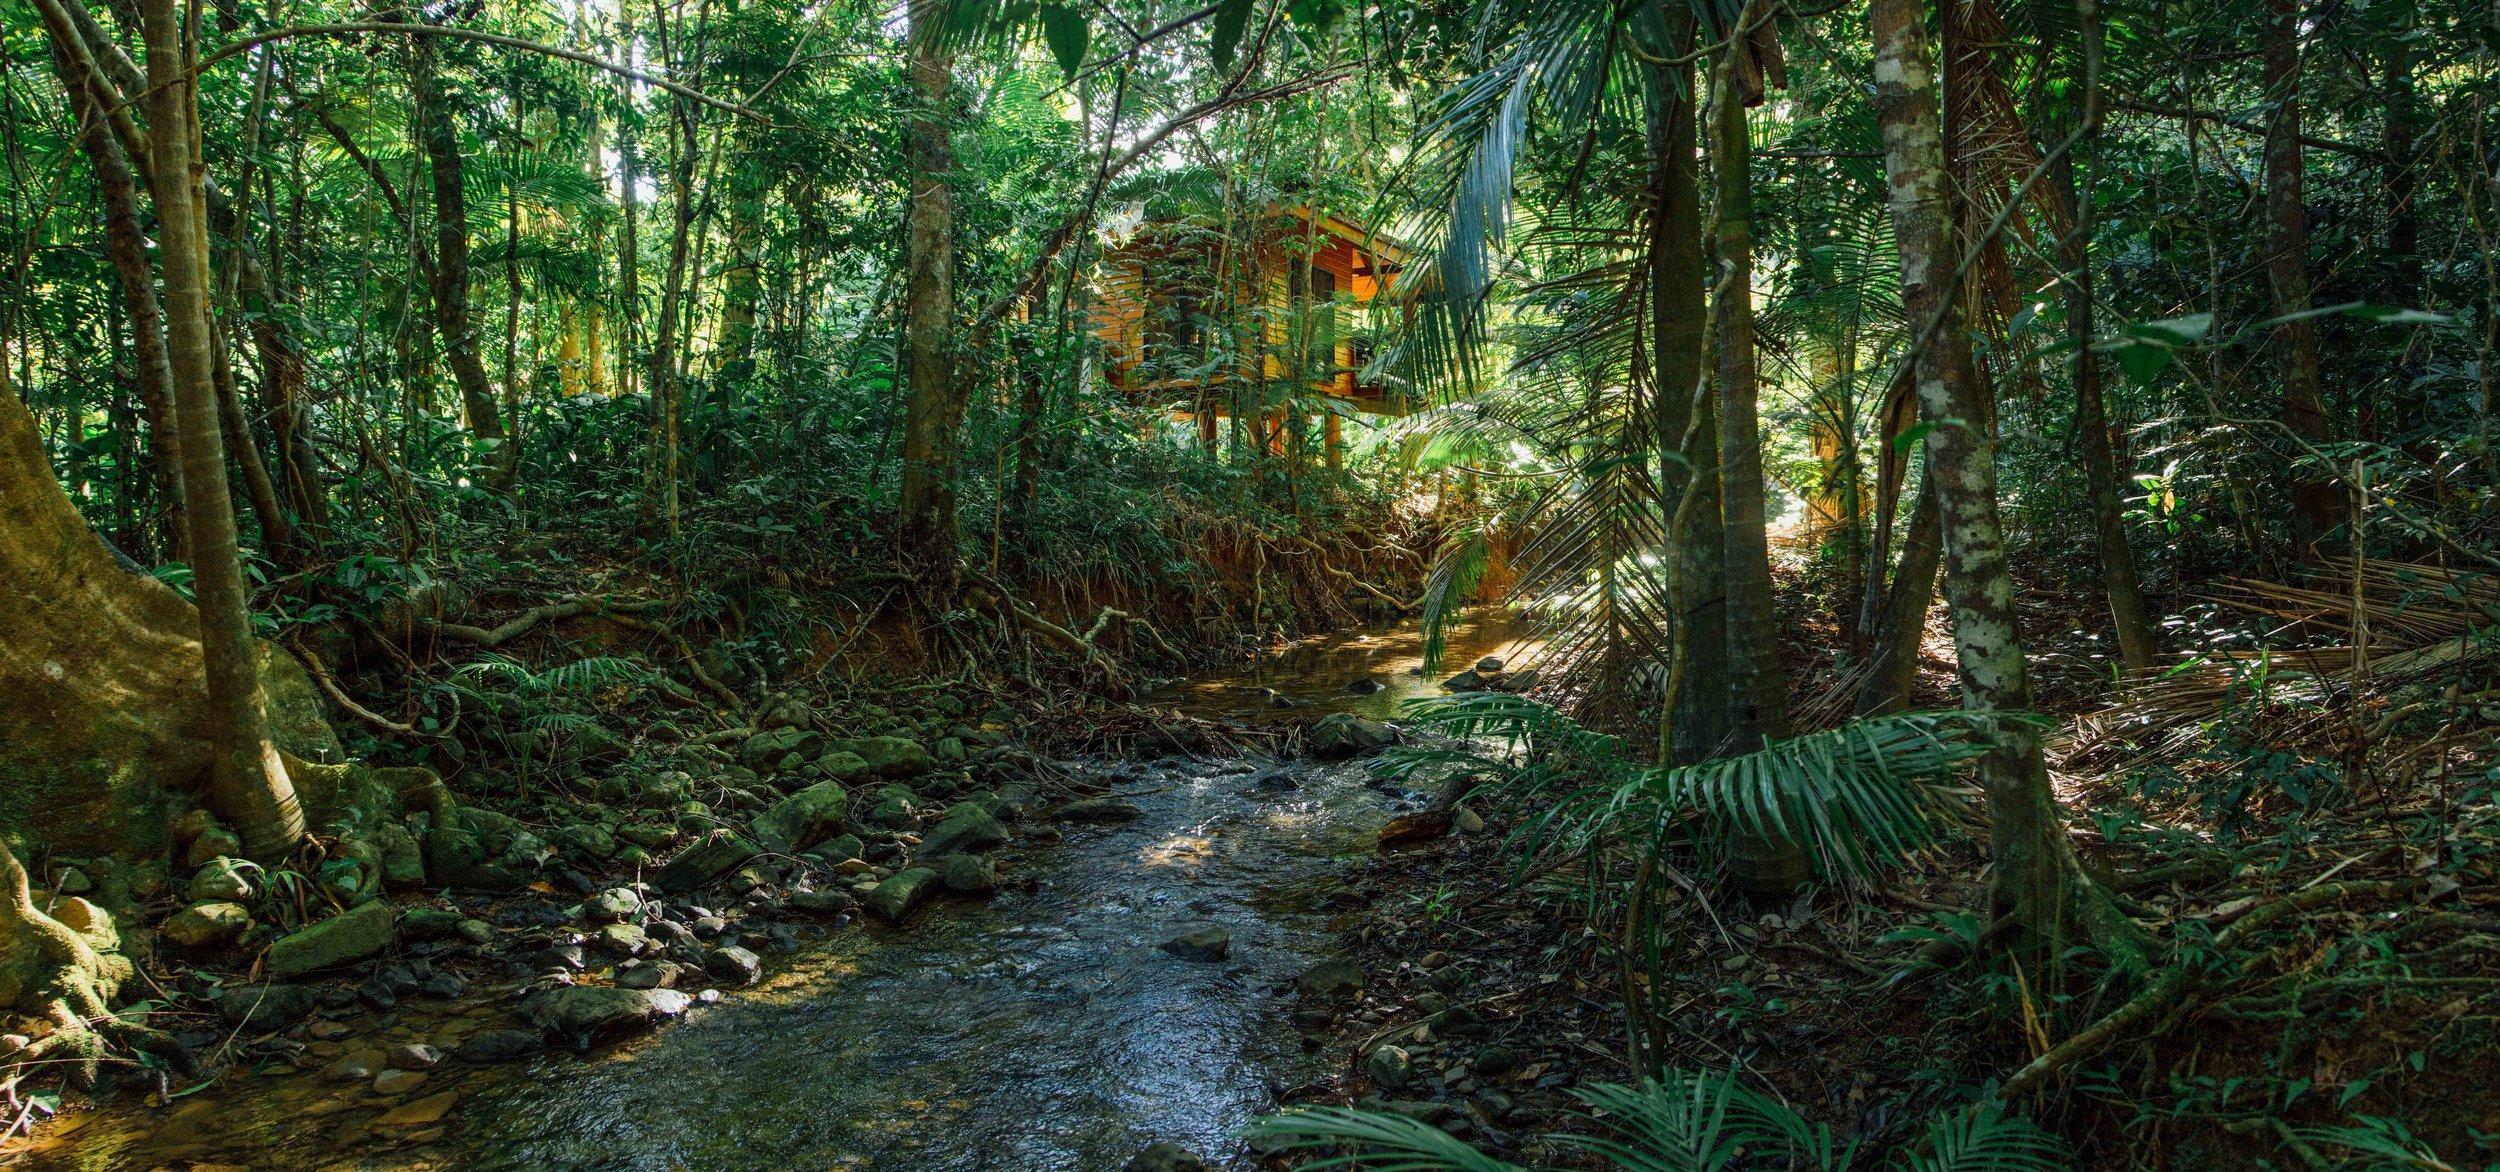 wildwood.cabin.creek